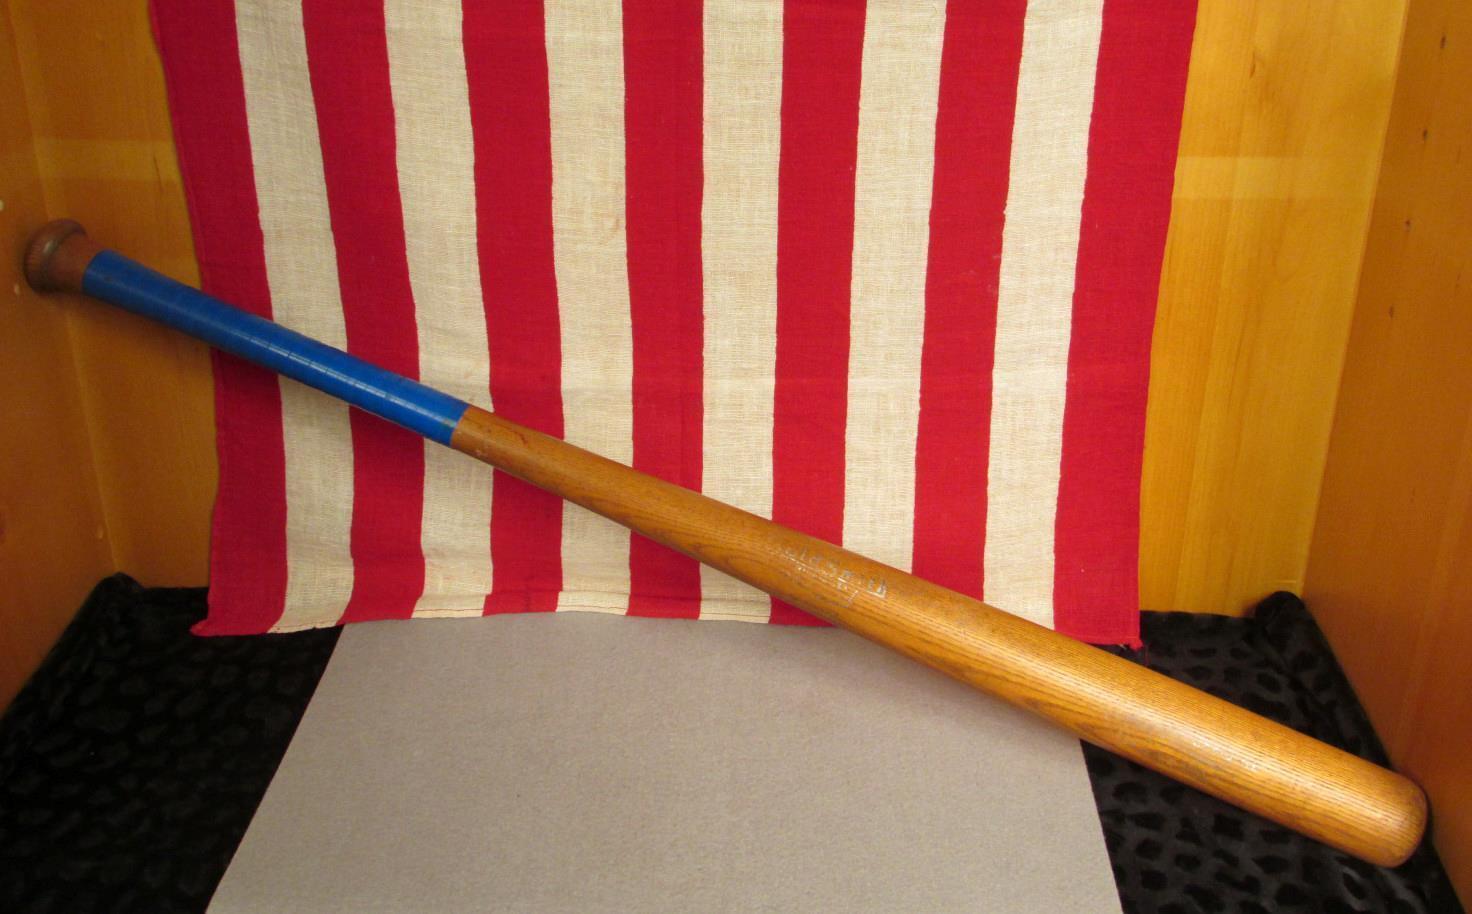 Vintage Goldsmith Holz Baseball Schläger 'Bevorzugt' No.24L Offizielles 33